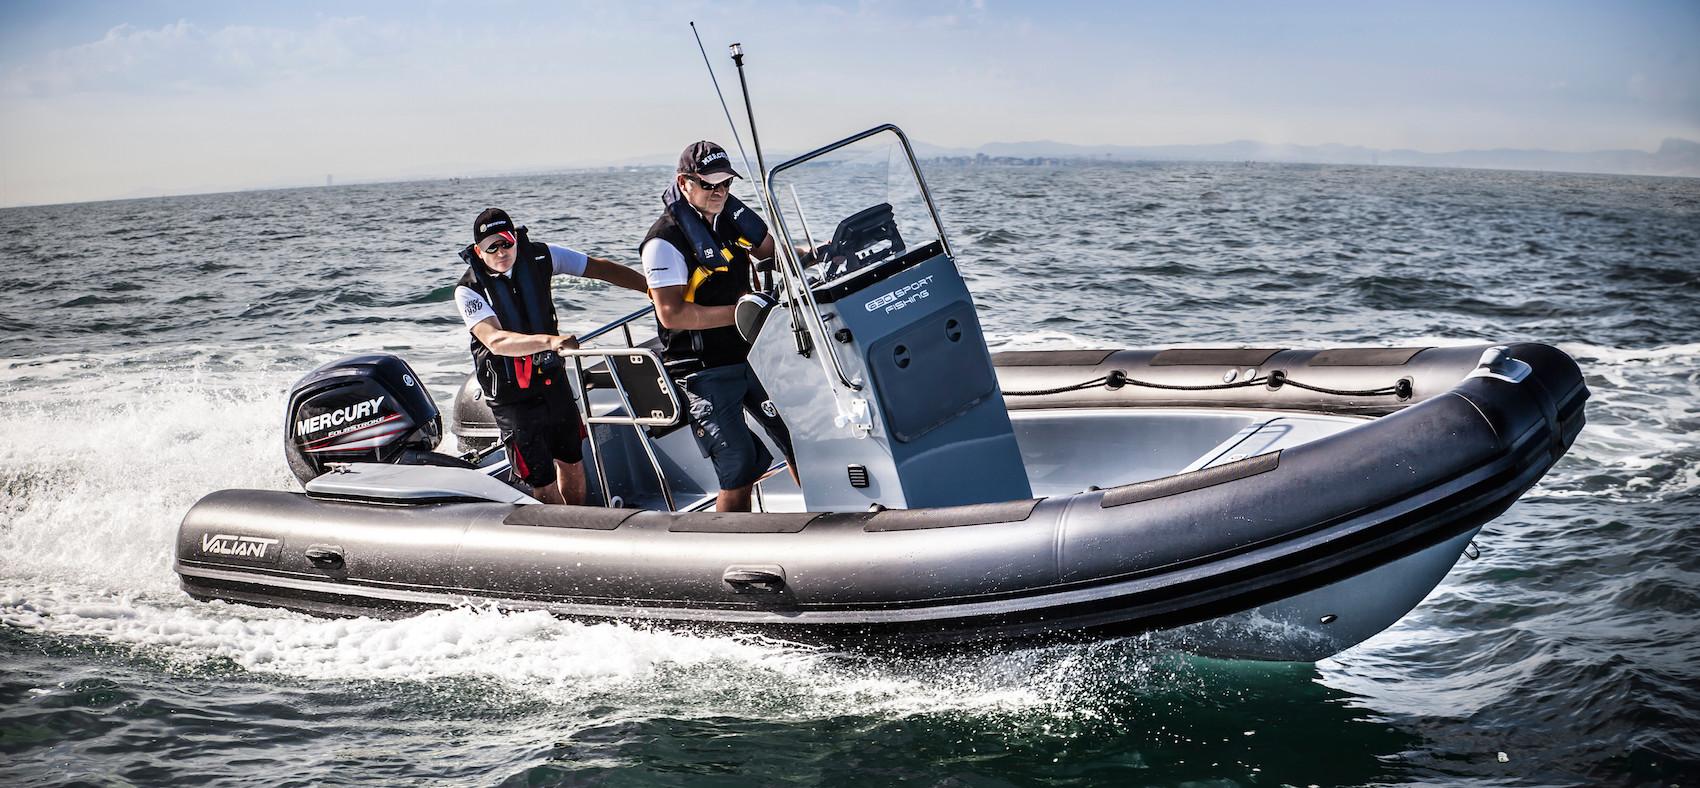 Valiant_630-Sport-Fishing_01.jpg